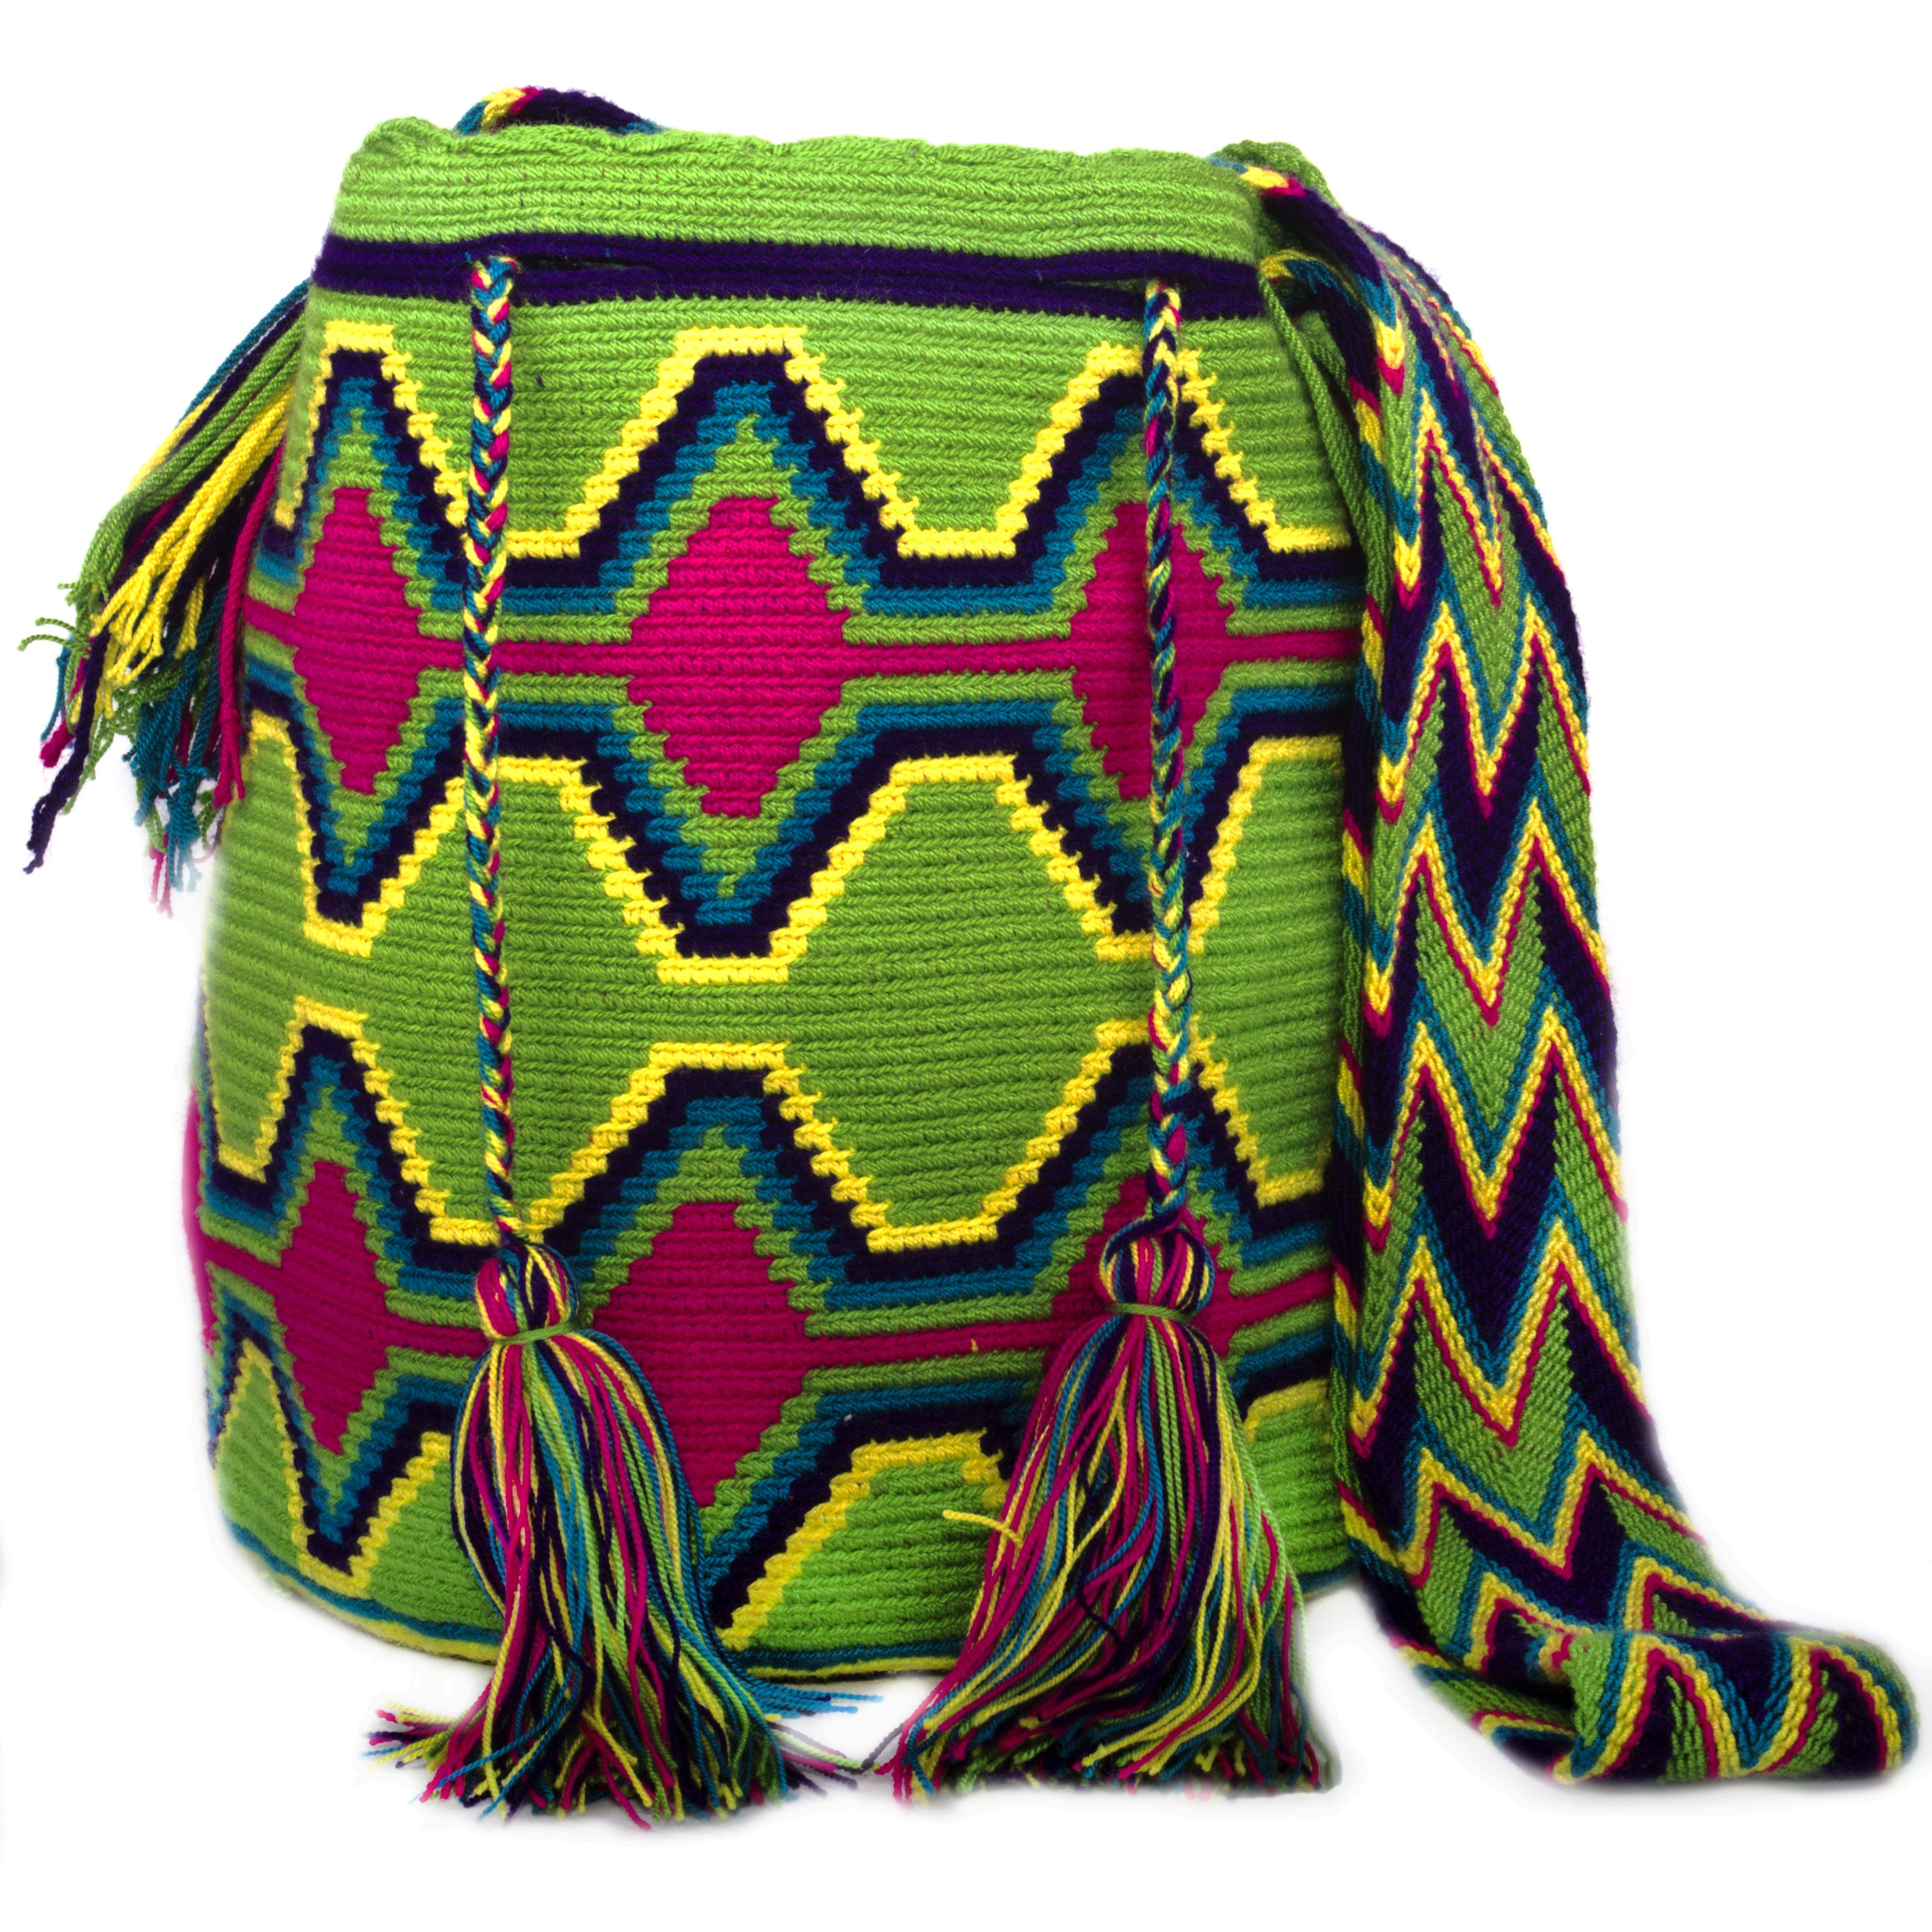 Chila Wayuu Bag Mochilas Crochet Mochila Ganchillo Bolsos Wuayu